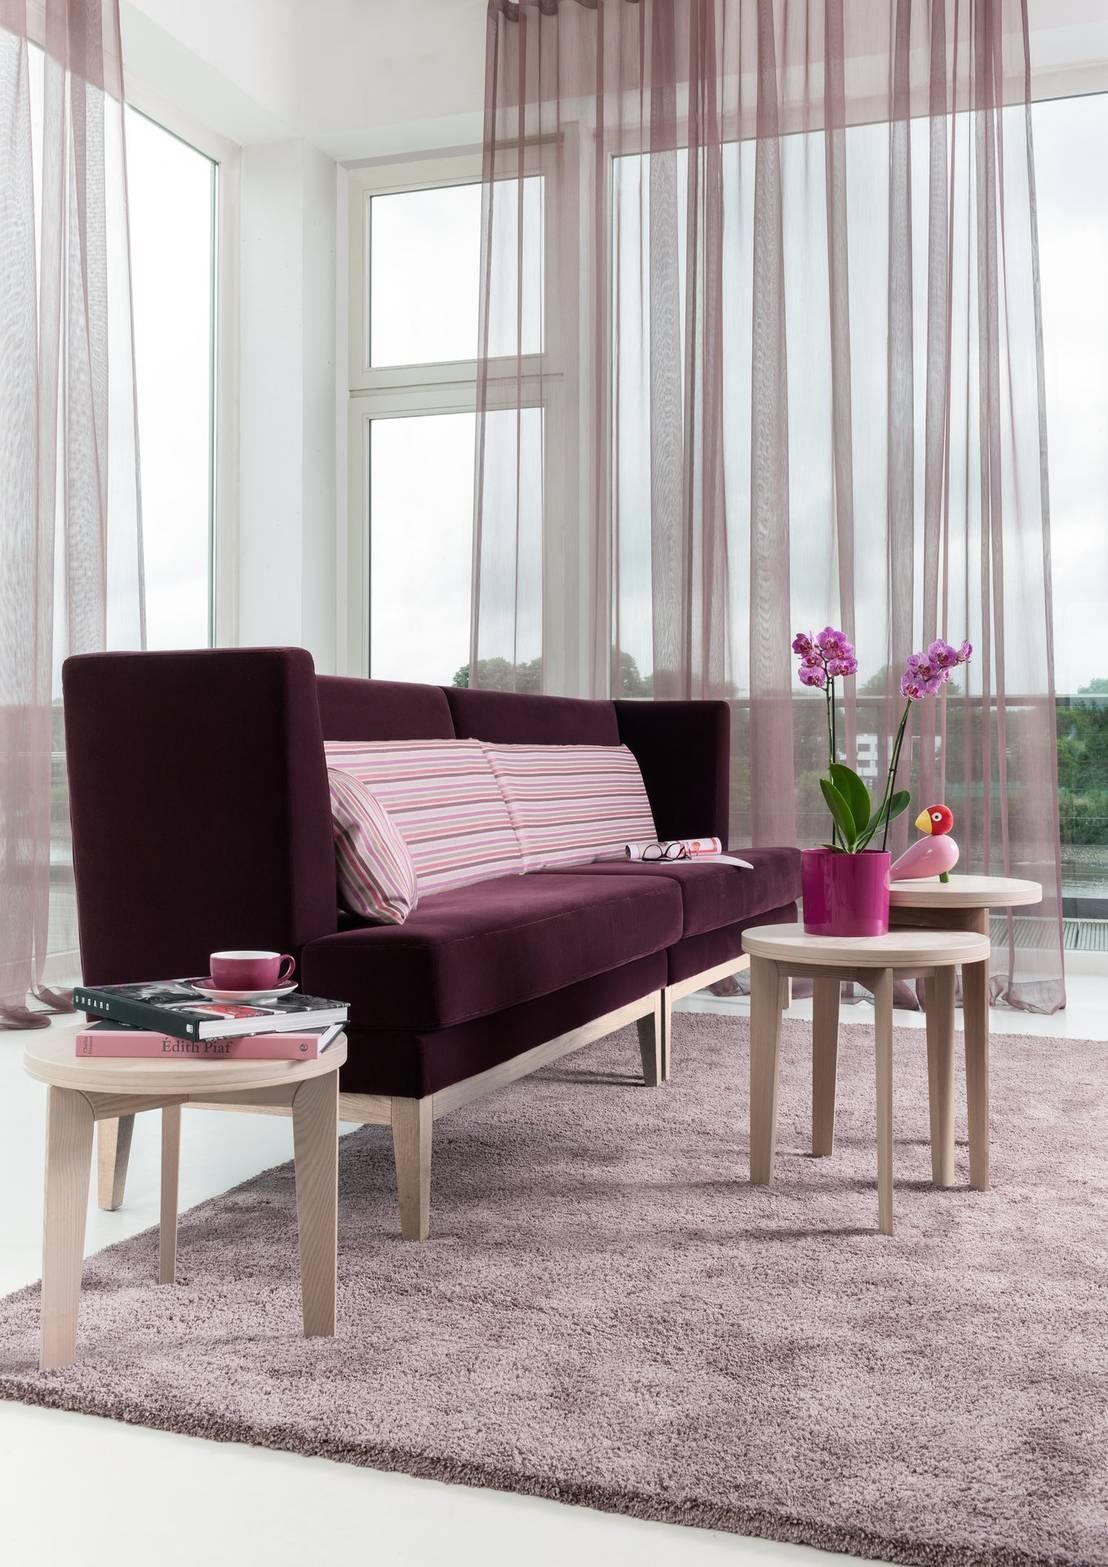 sigma von jab josef anstoetz kg homify. Black Bedroom Furniture Sets. Home Design Ideas